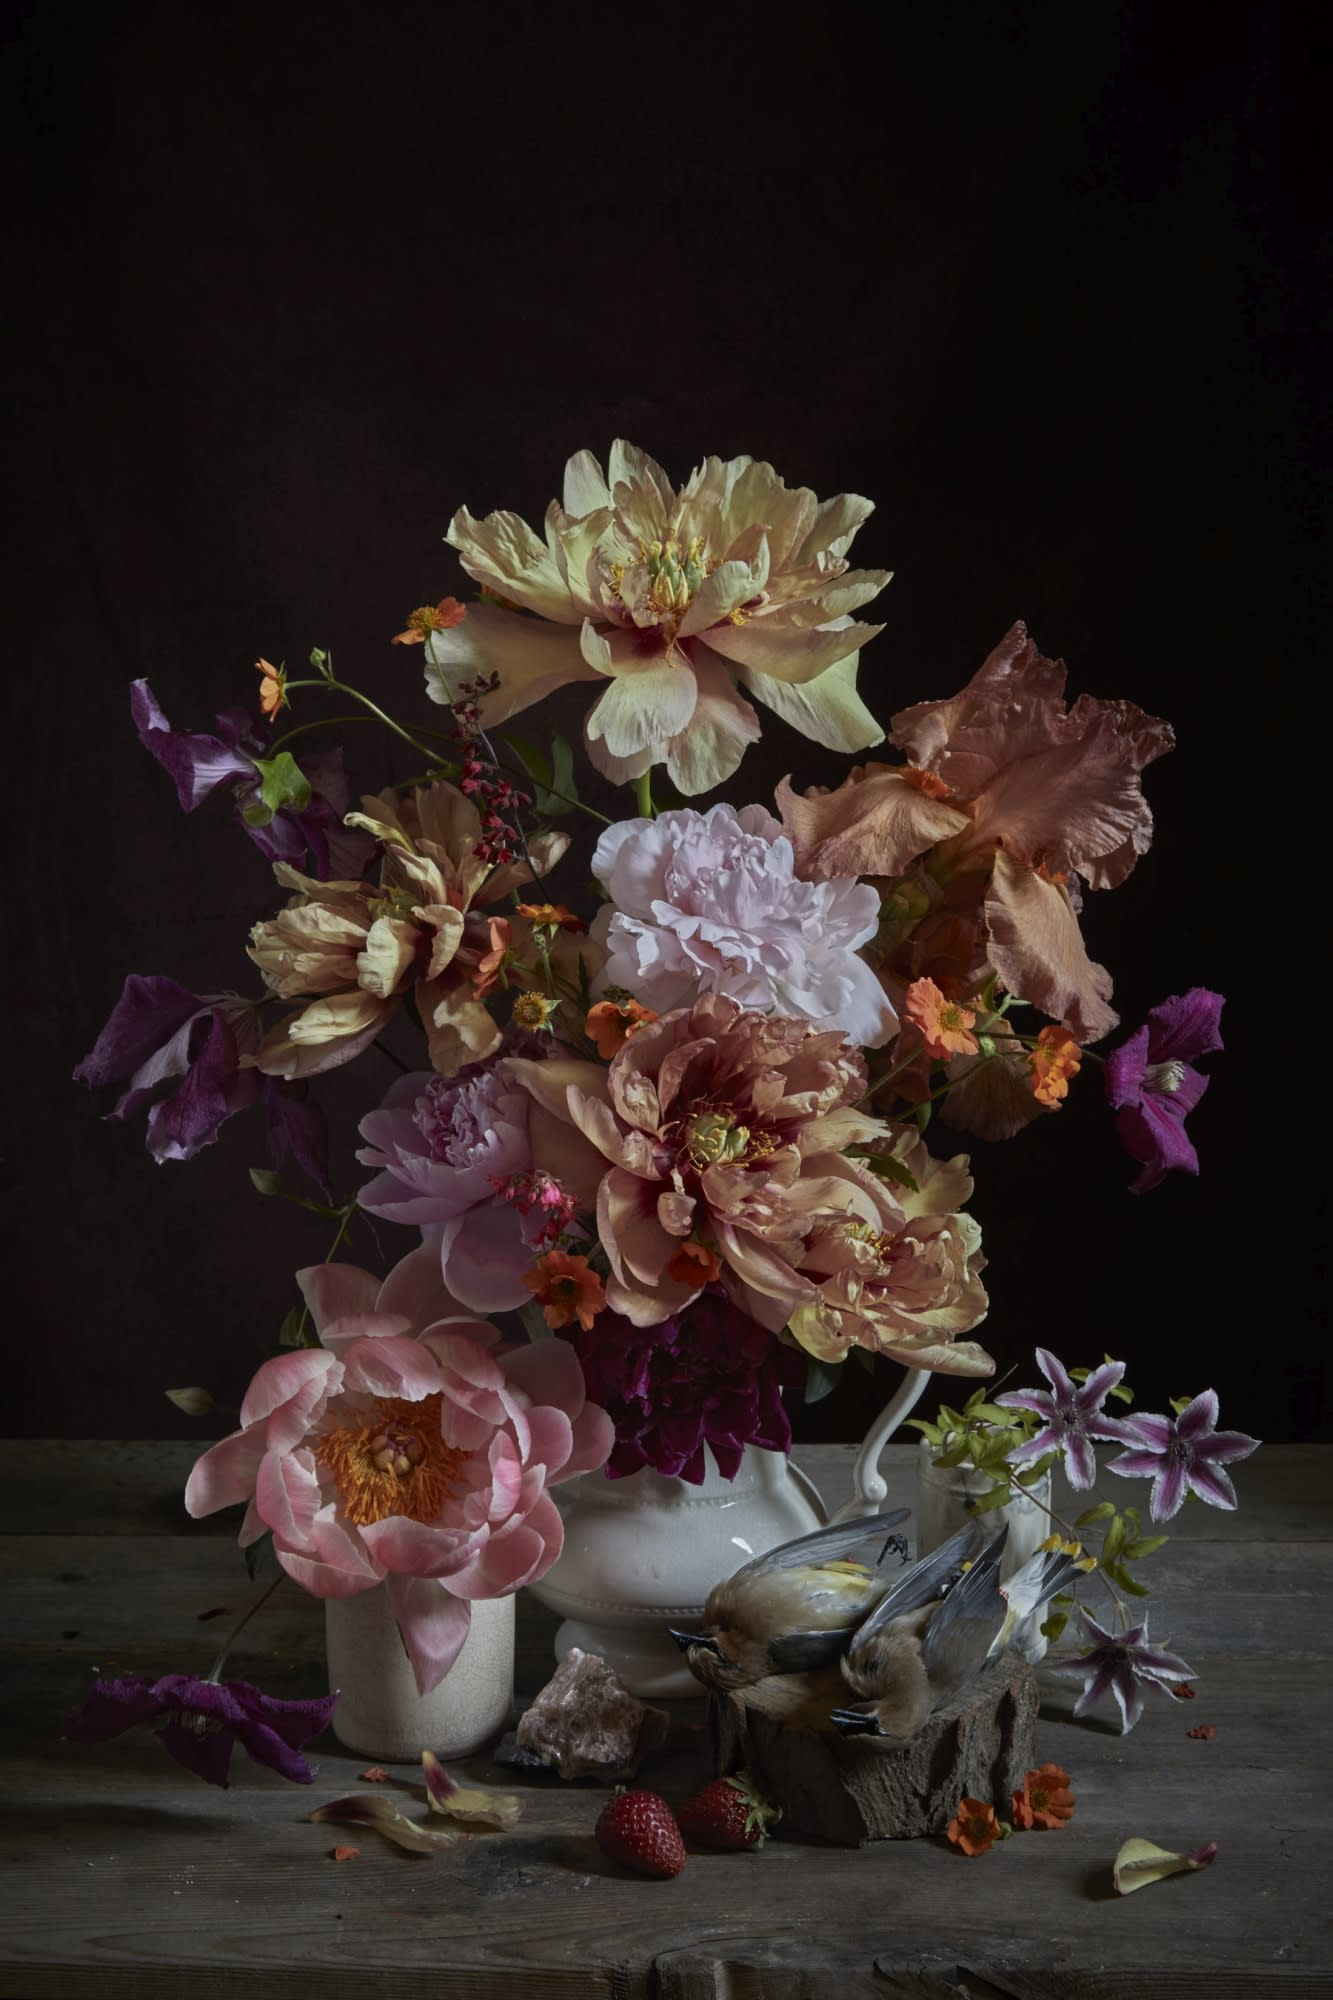 'Peony & Cedar Waxings' by Kristin Sjaarda at Gallery 133